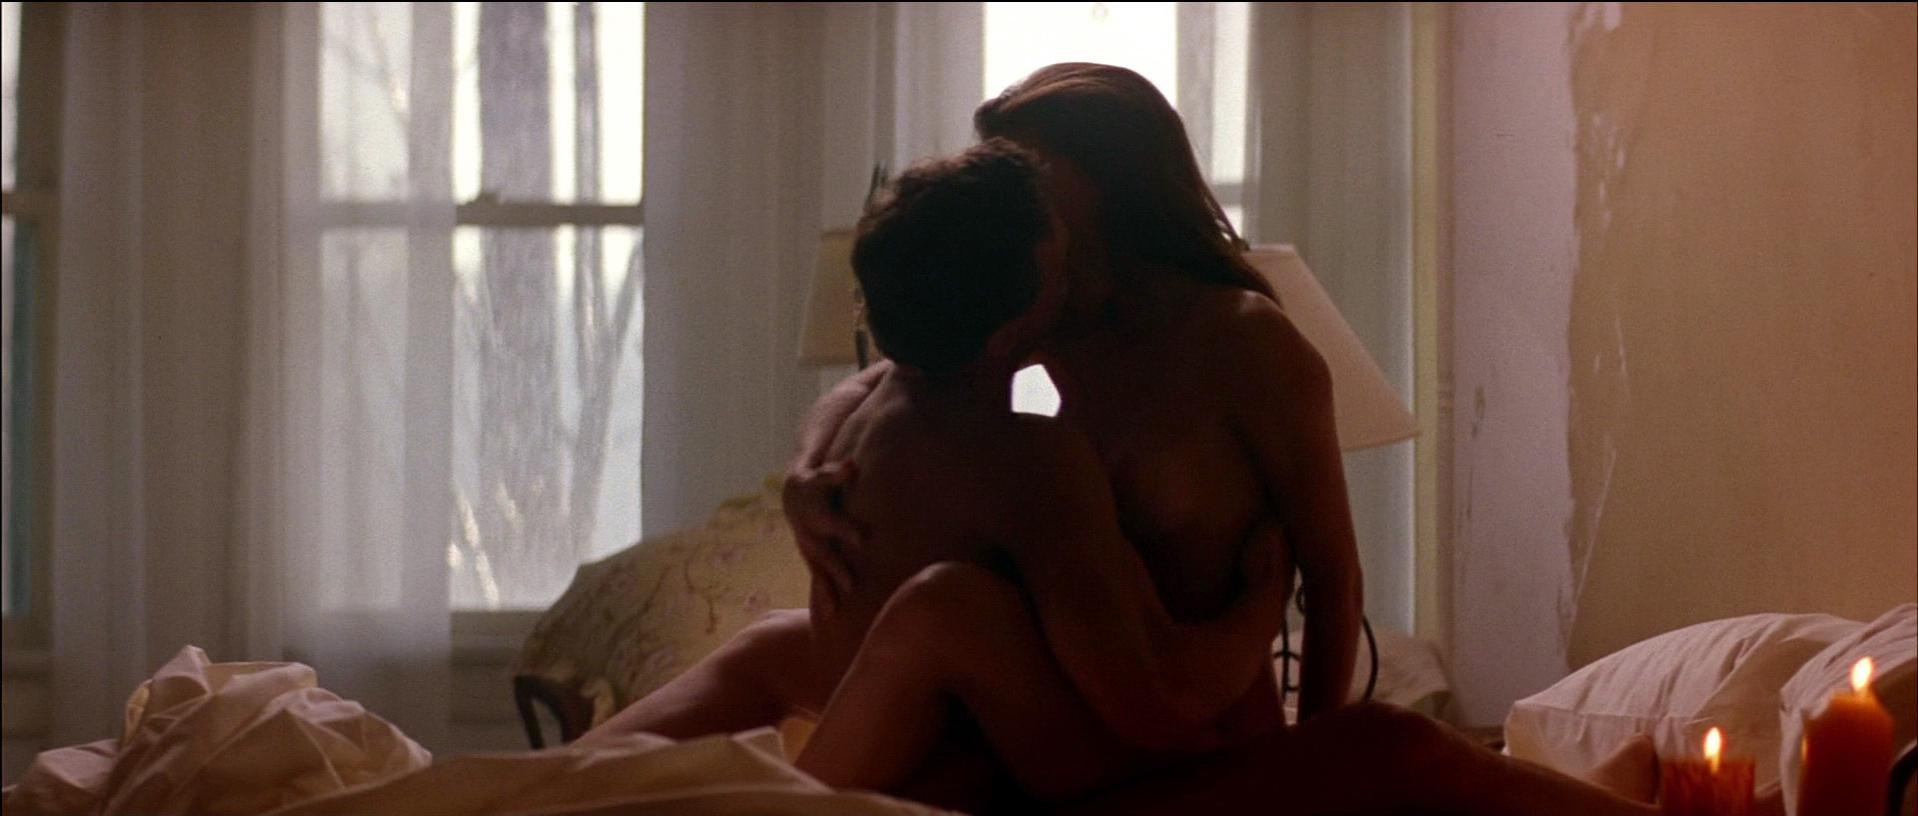 Ashley shannon nude